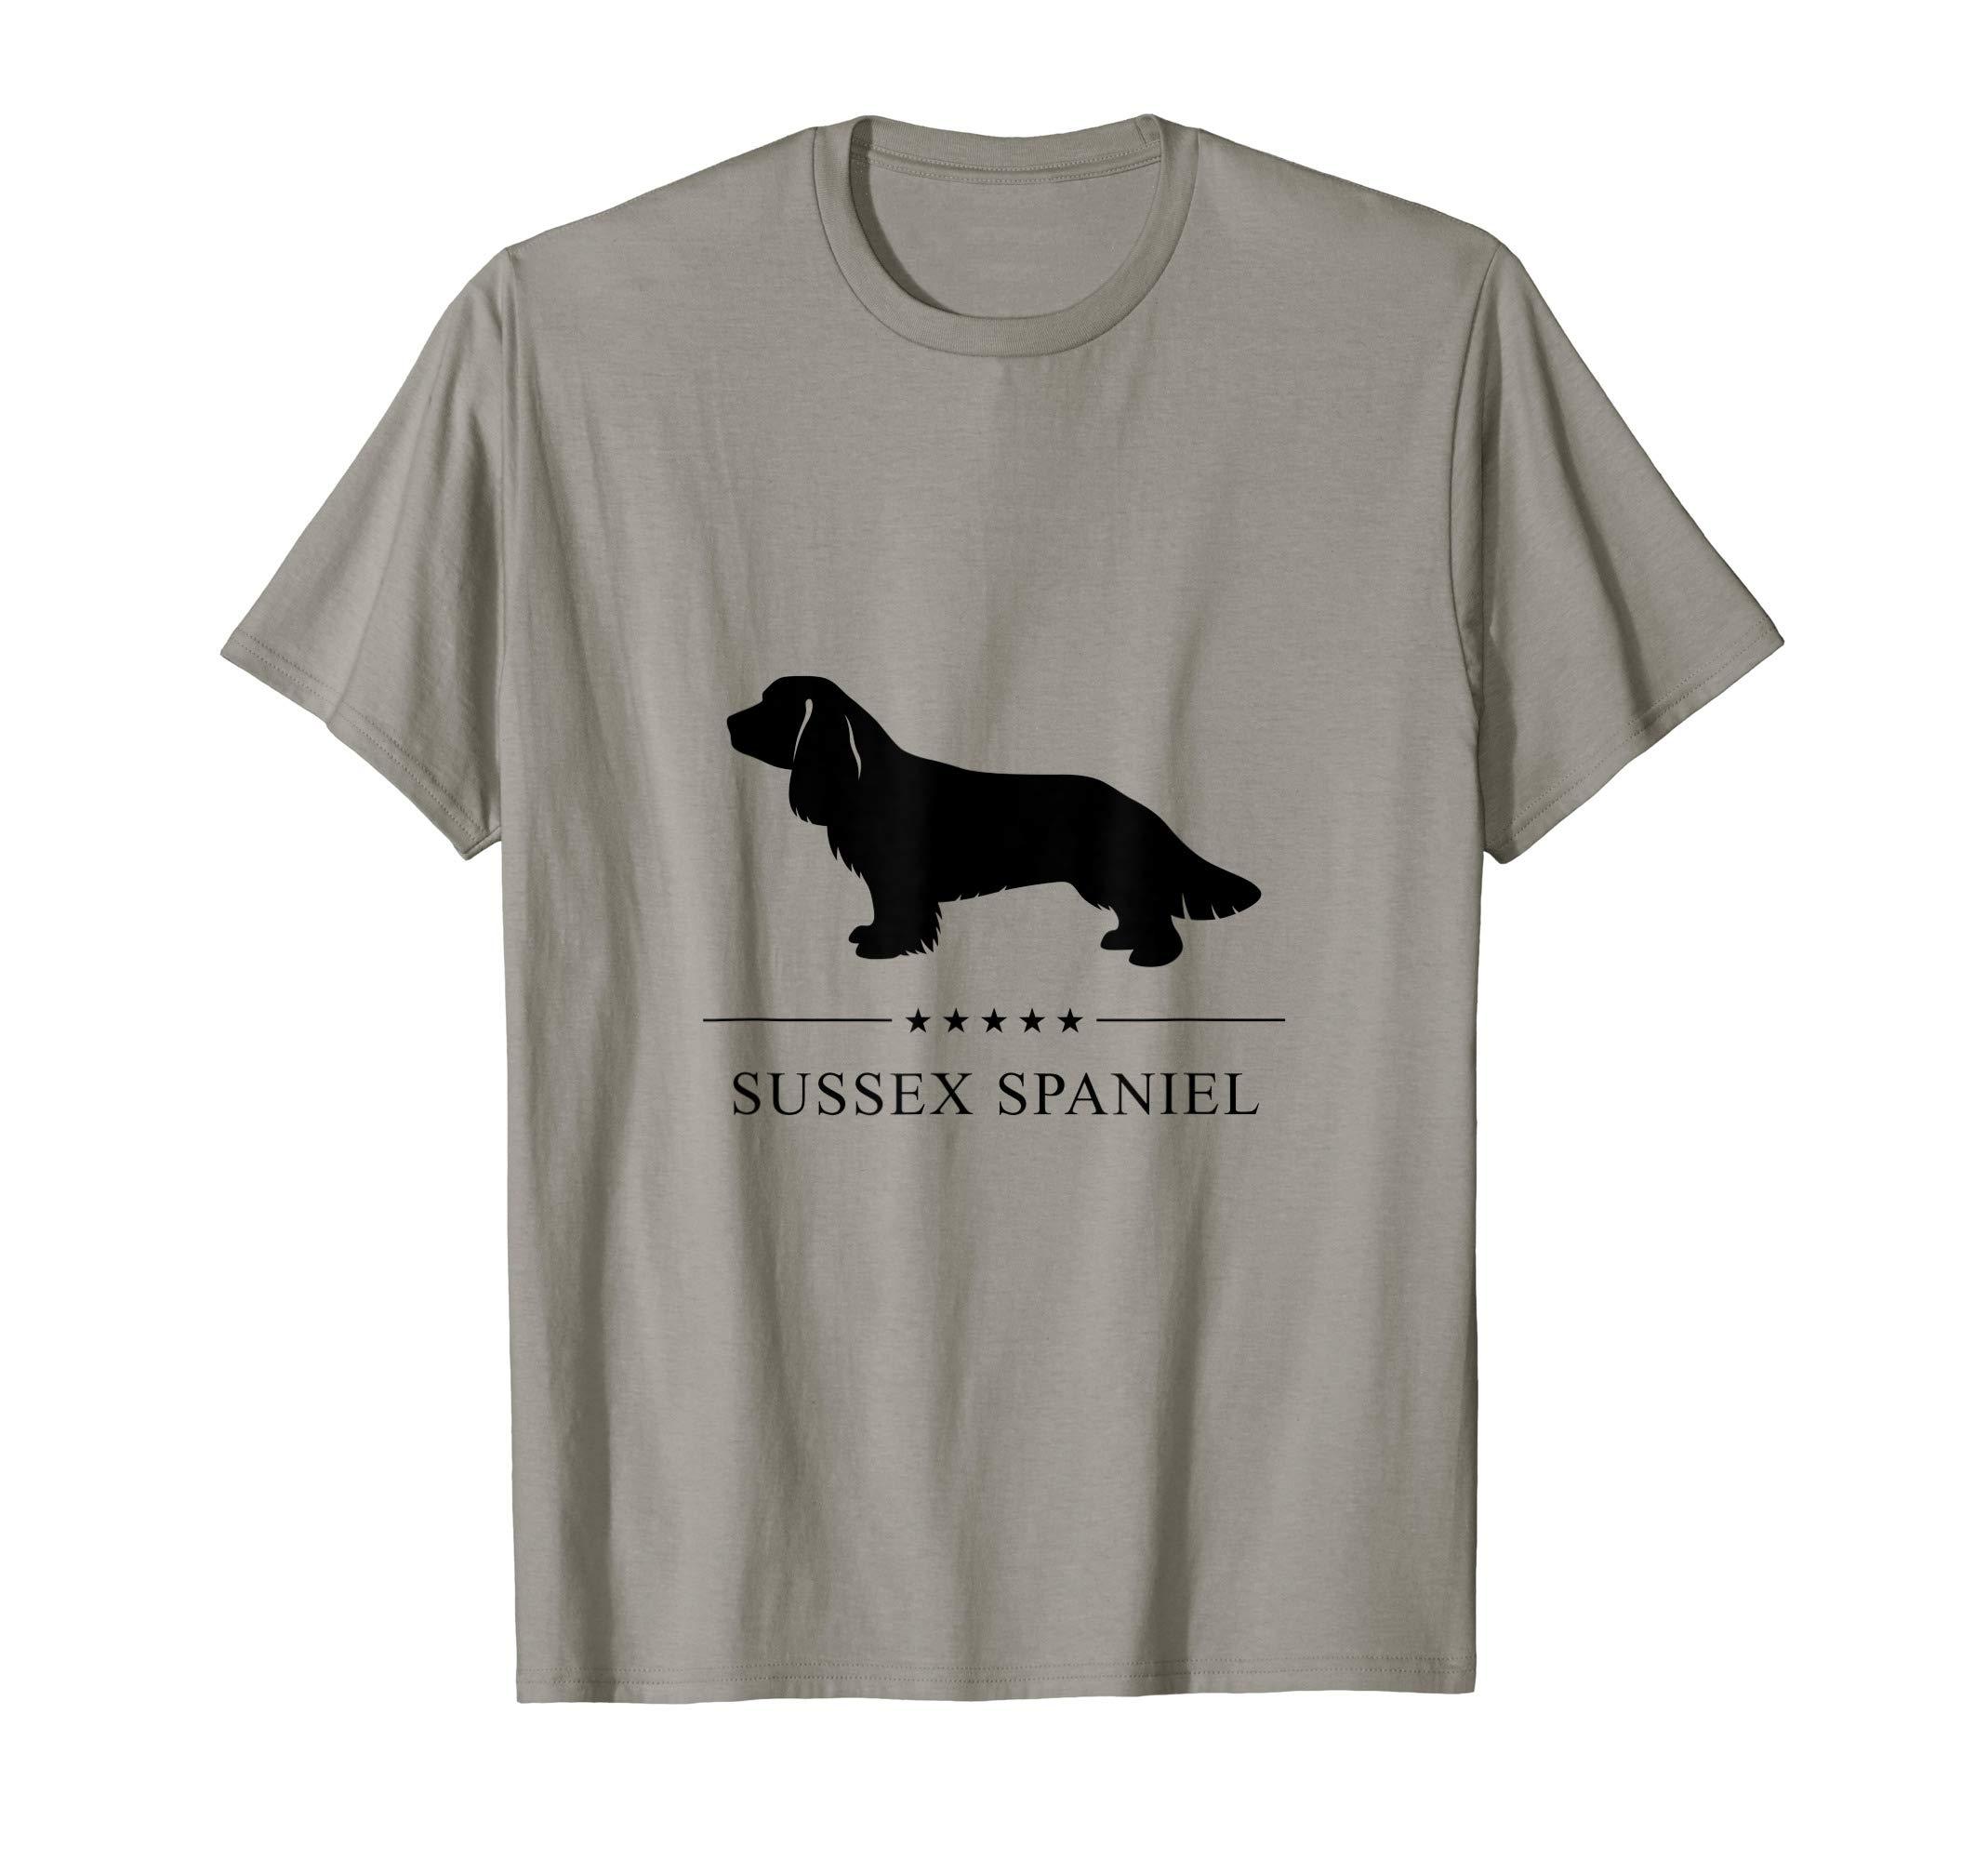 Sussex Spaniel Black Silhouette T-Shirt 1